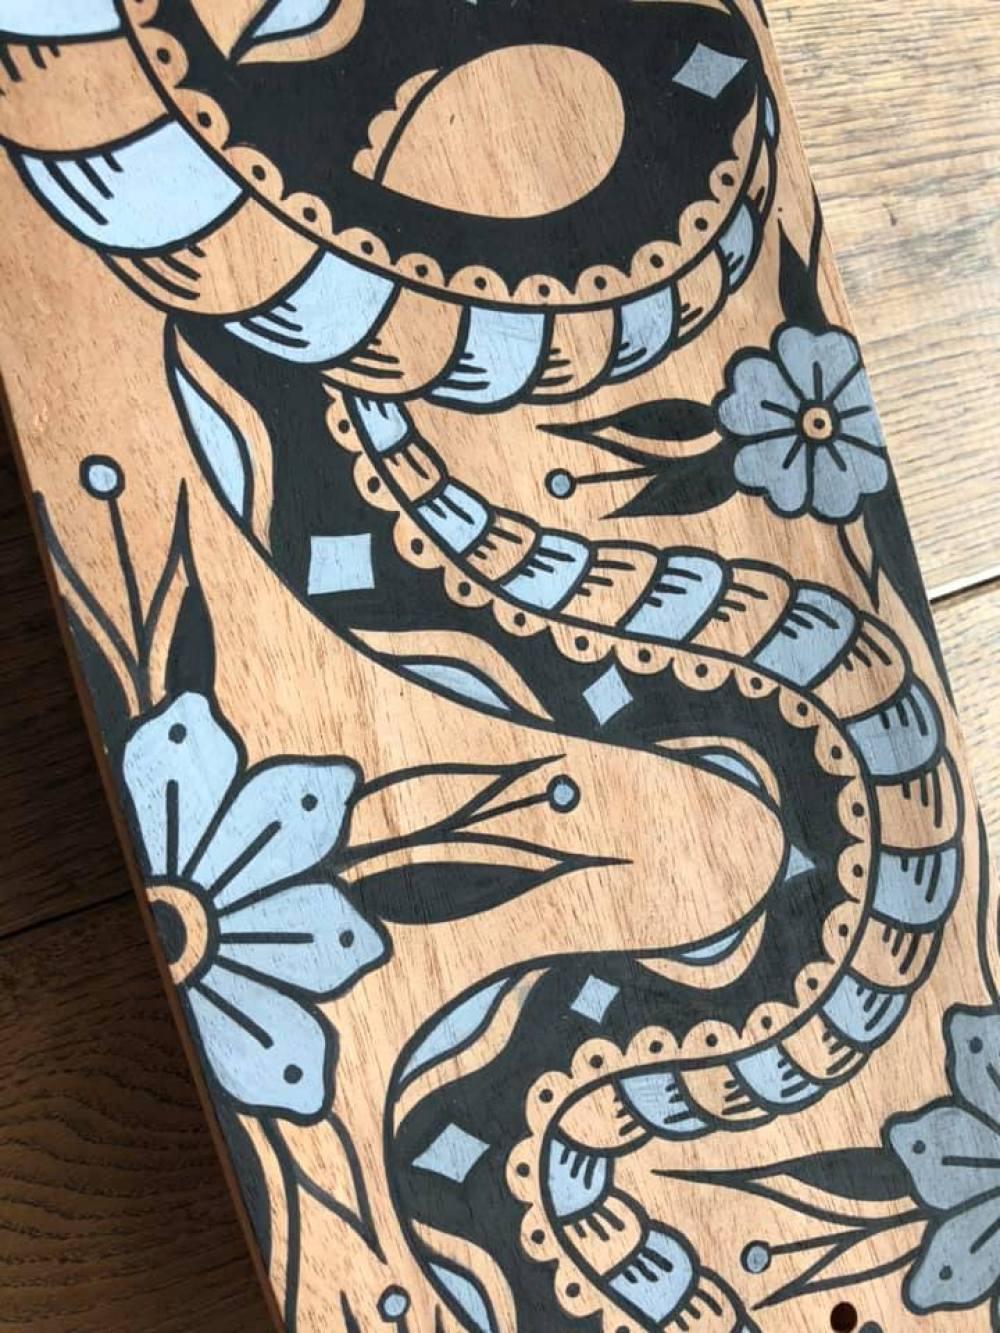 Custom Skateboard By Grom Tattooer 3